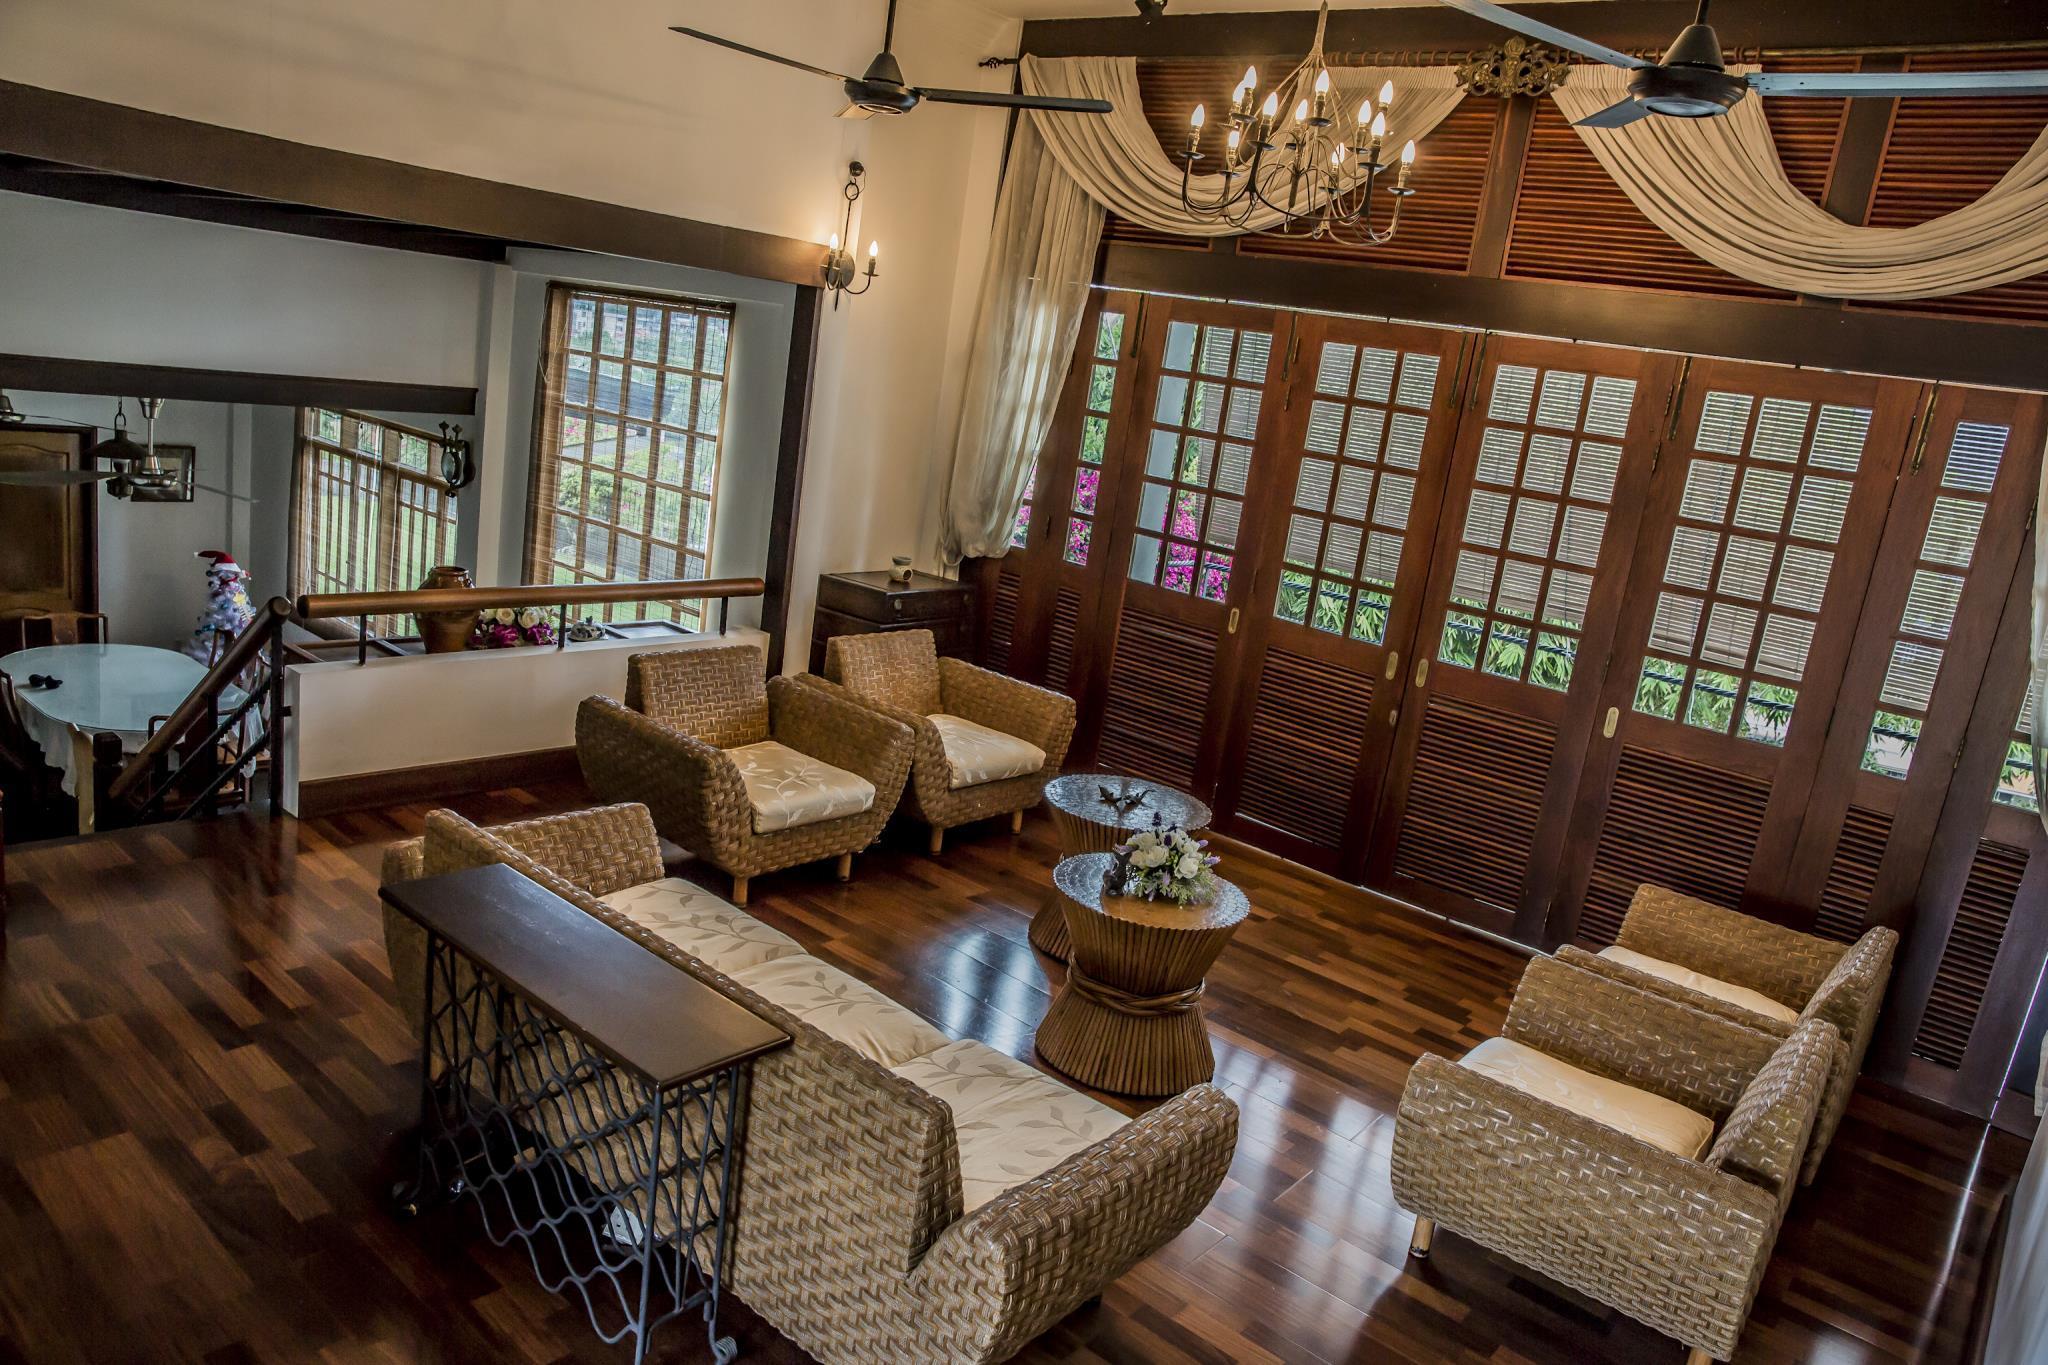 The Colonial Villa